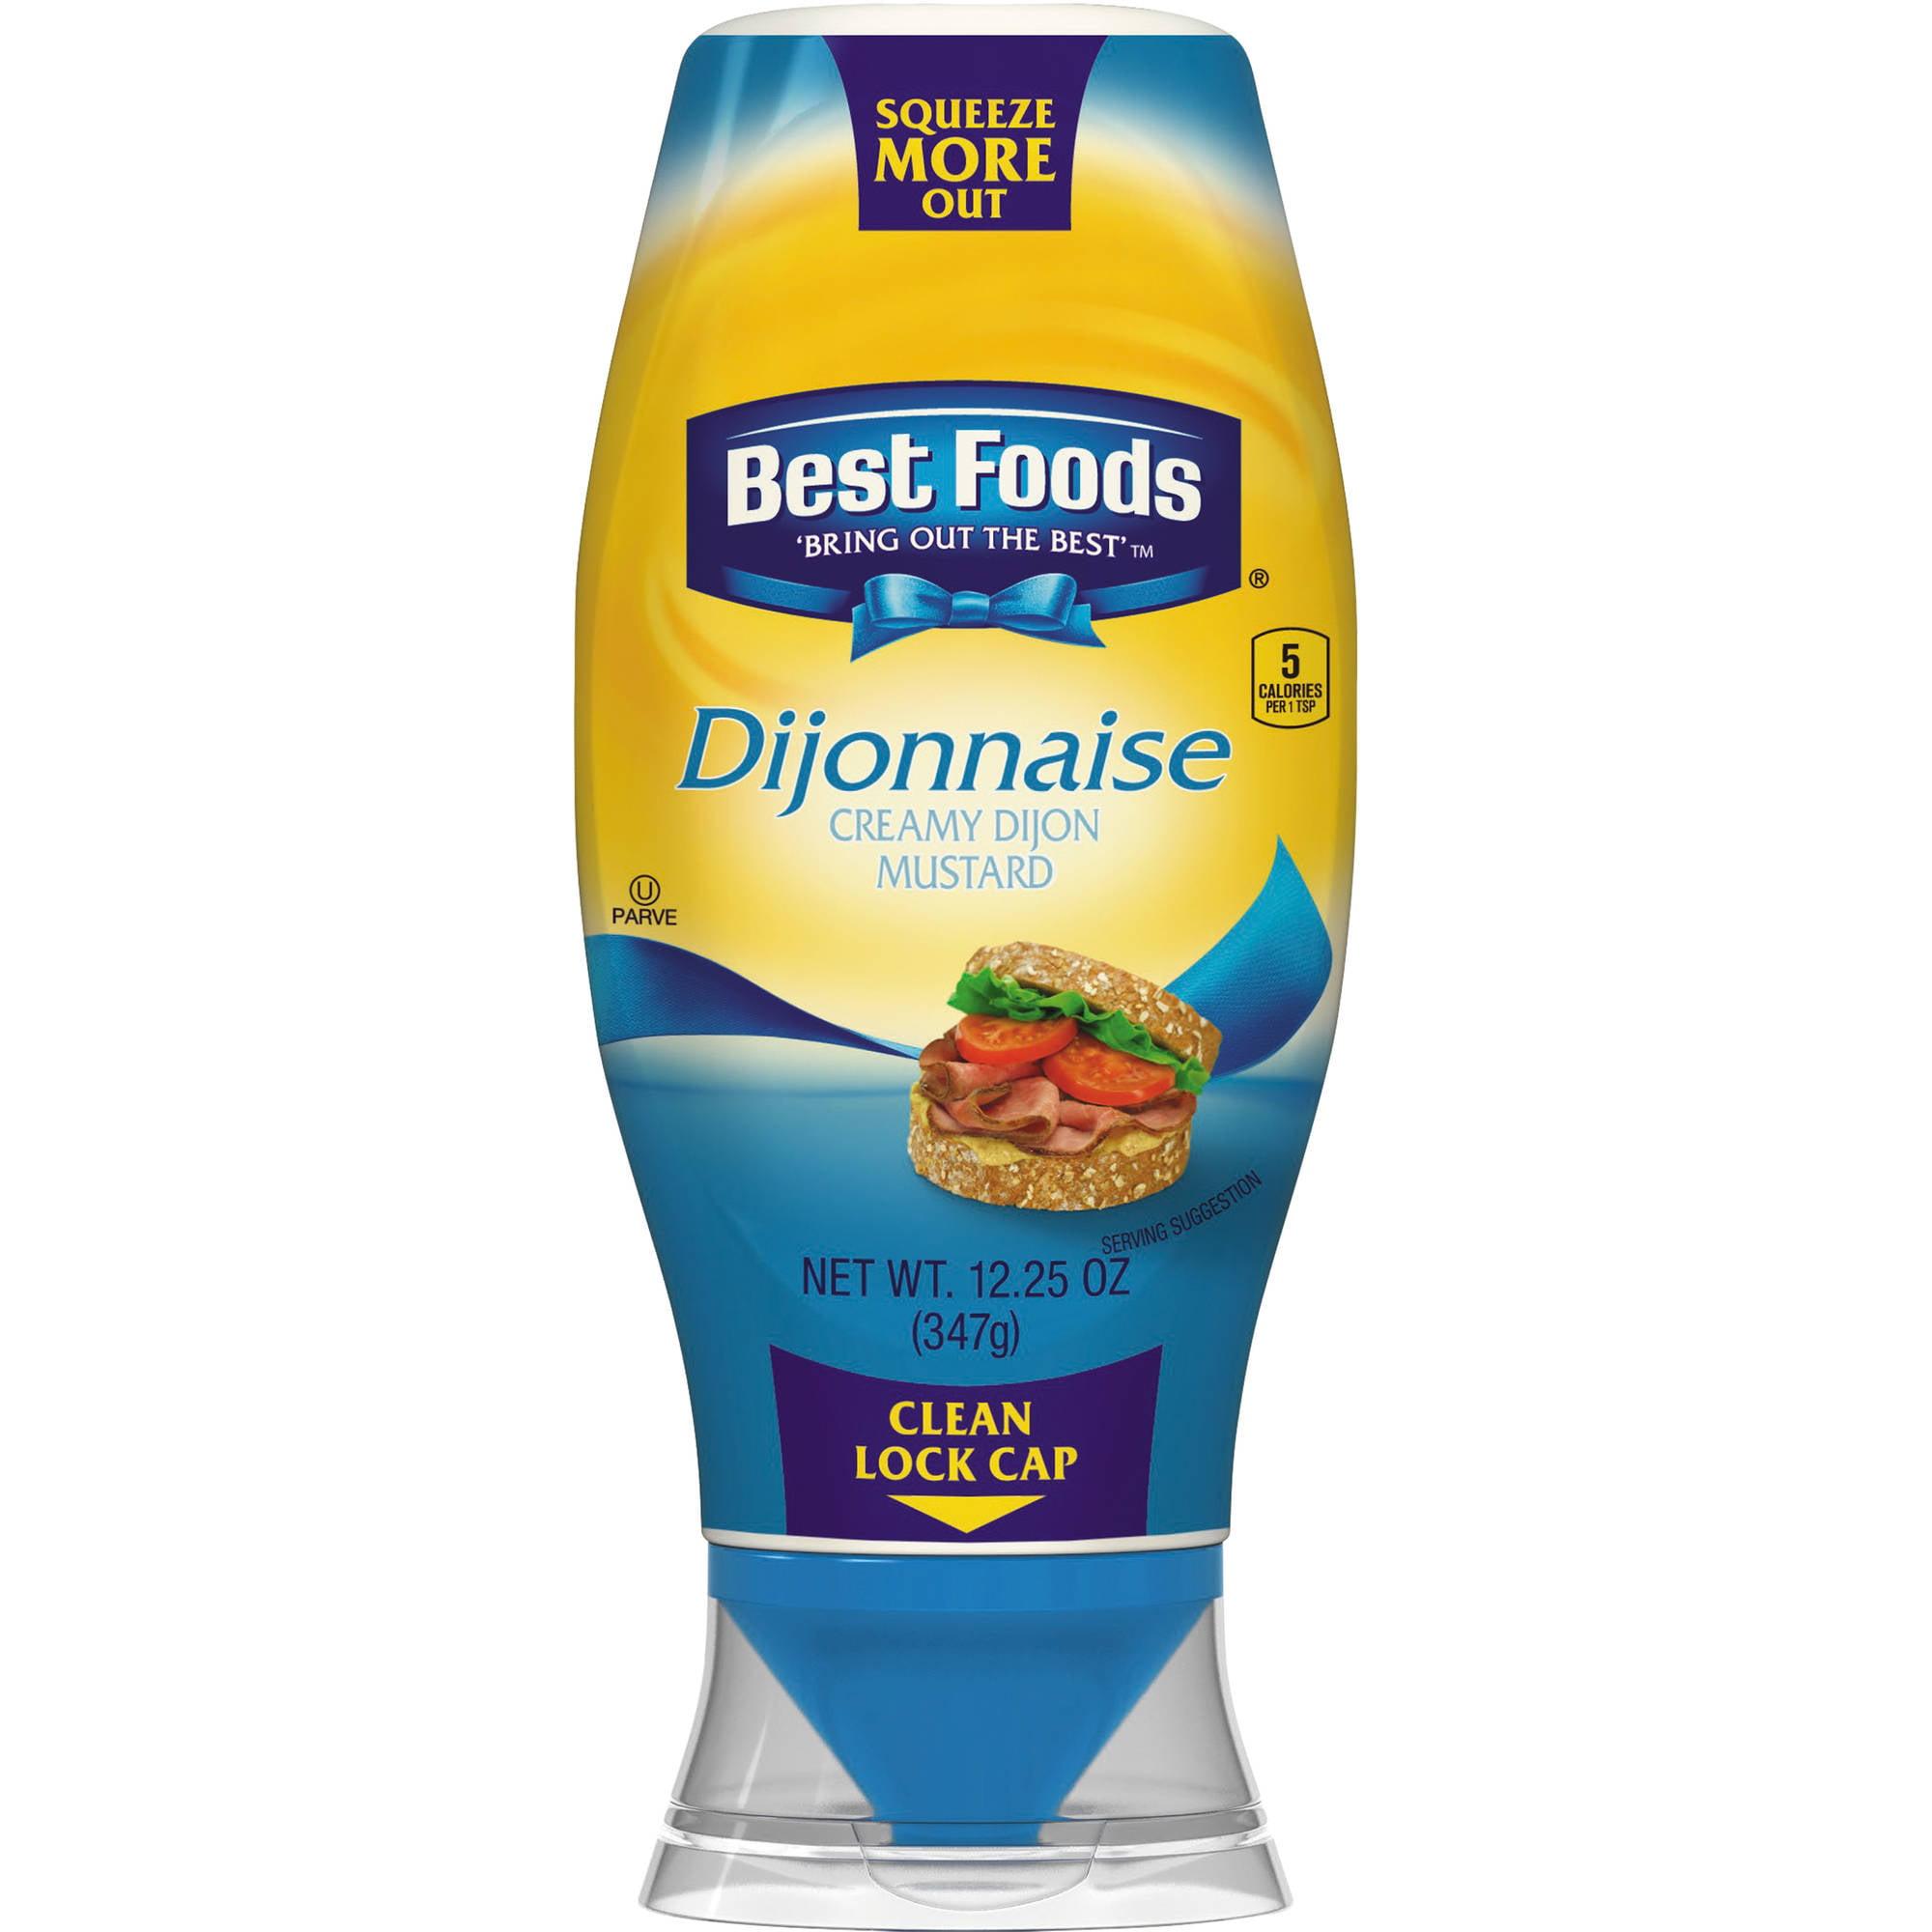 Best Foods Dijonnaise Creamy Dijon Mustard, 12.25 oz by Unilever